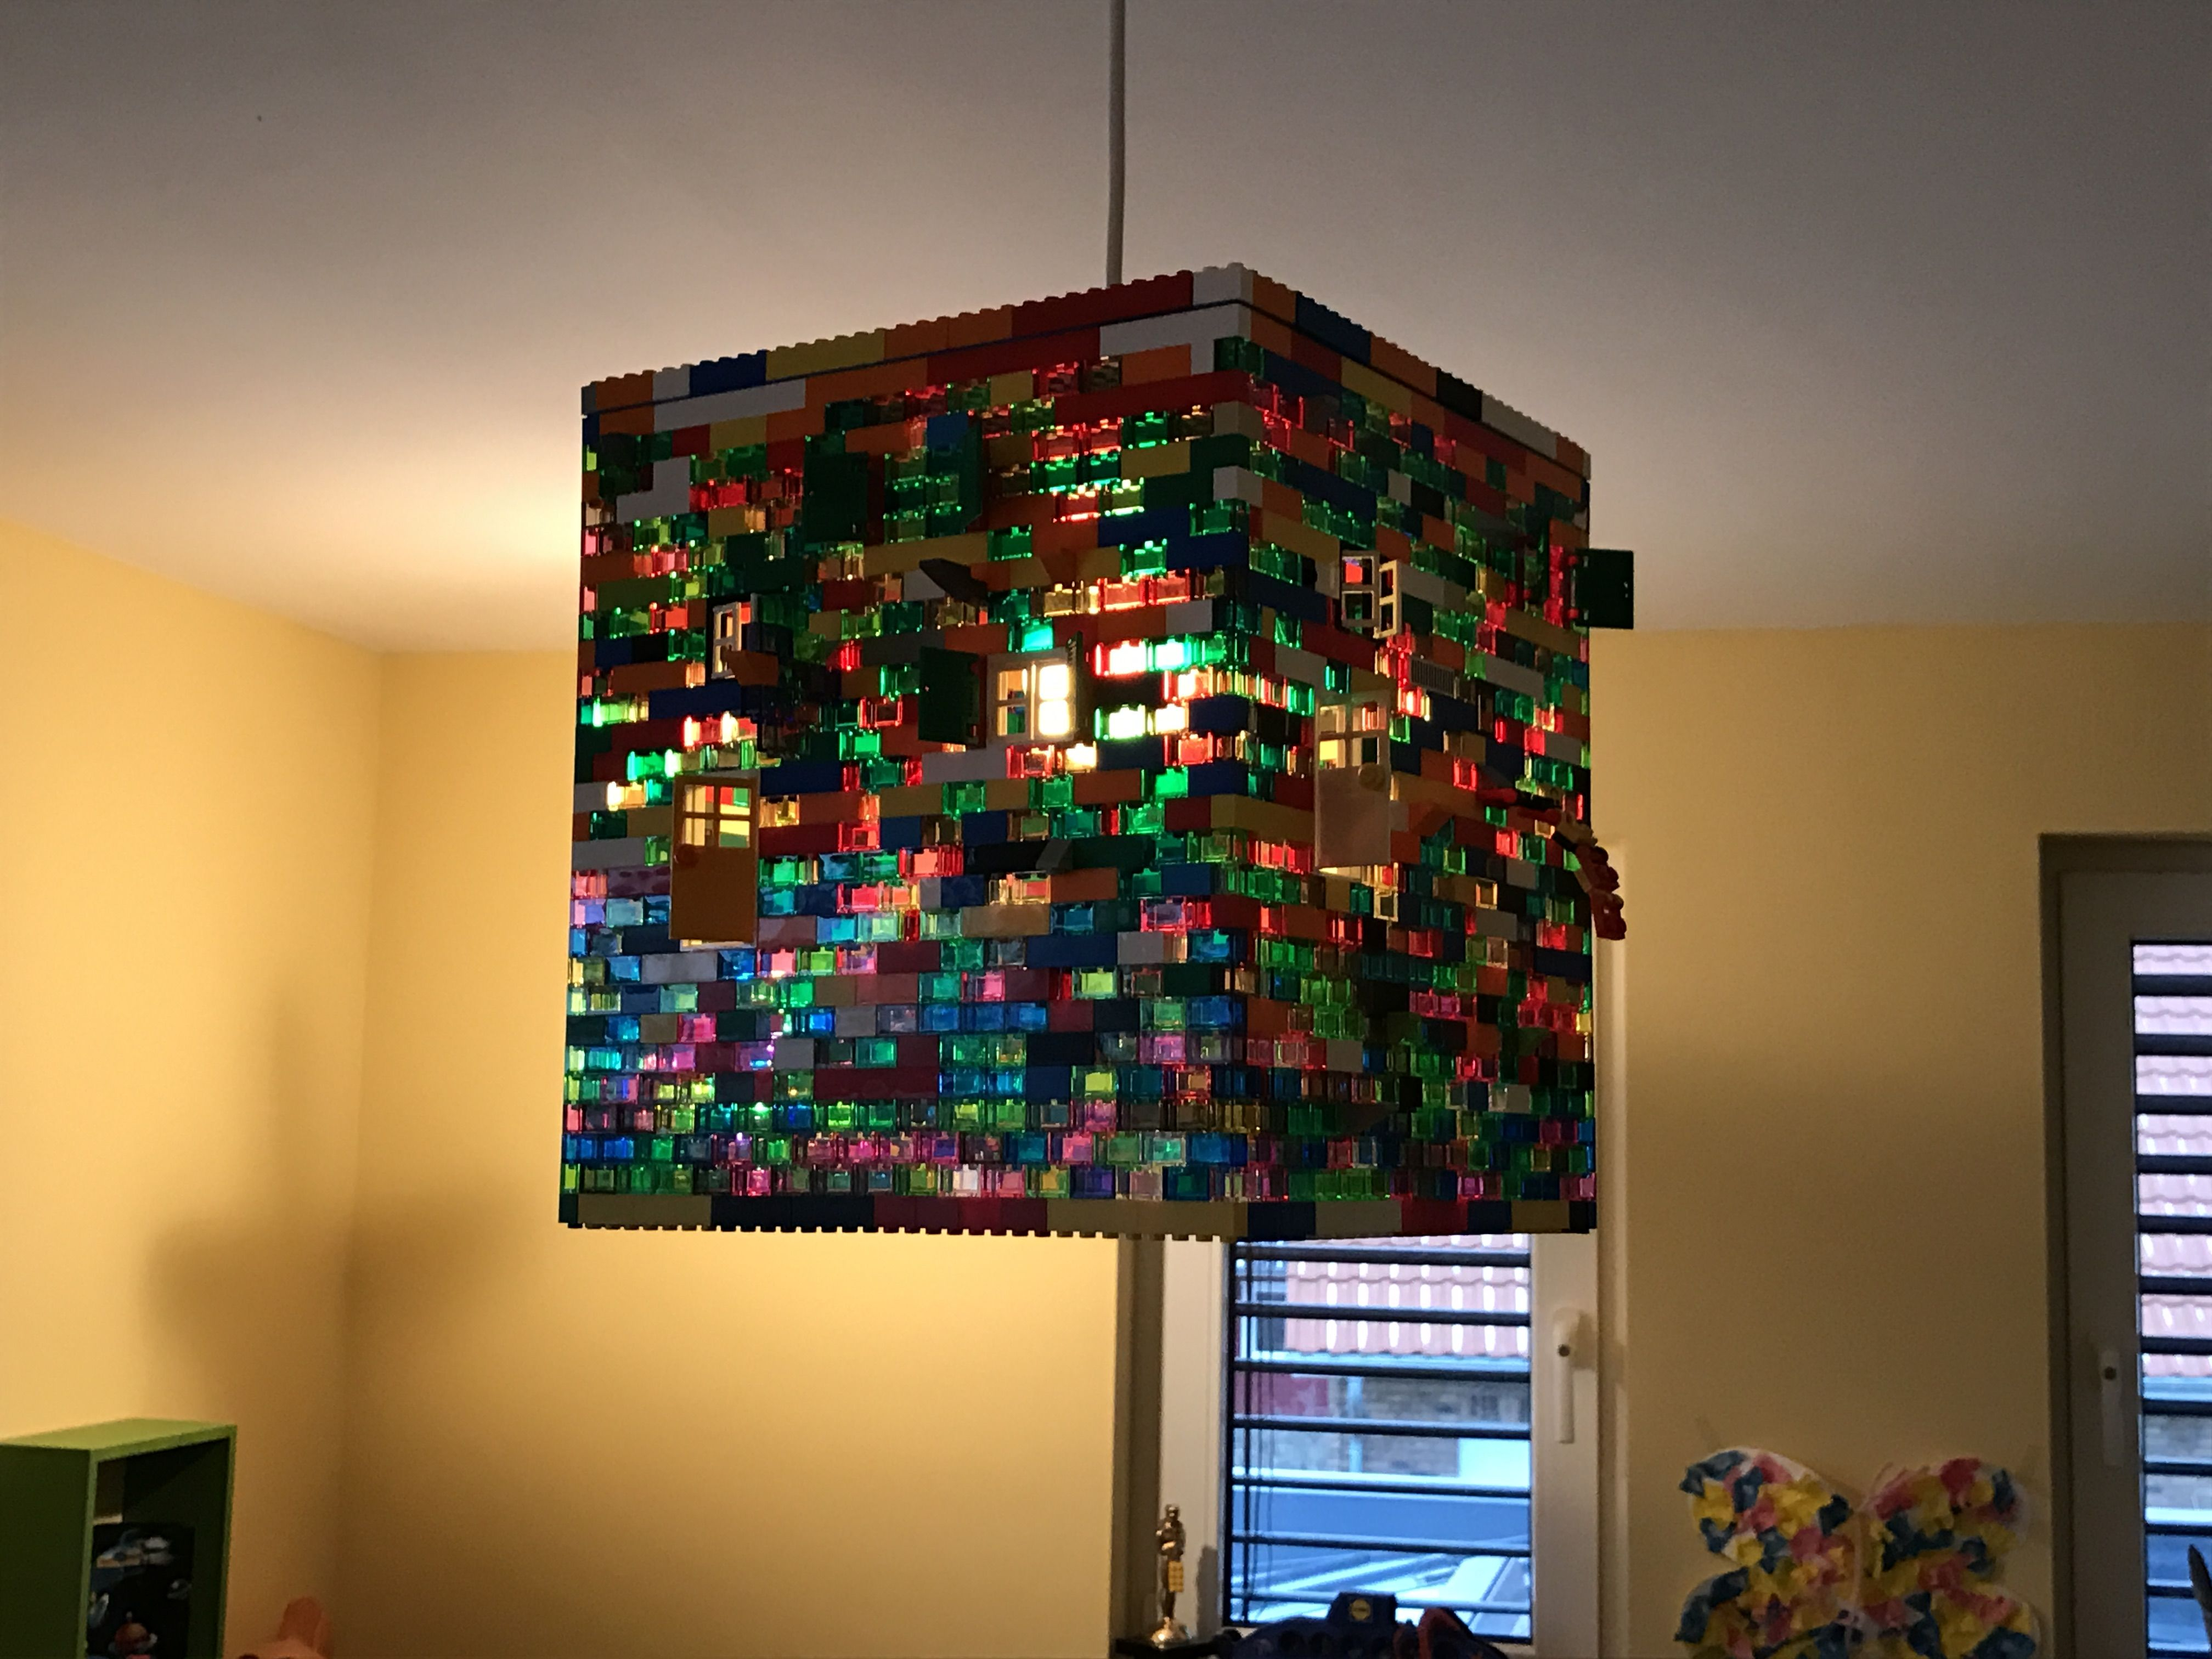 Babyzimmer Deckenlampe ~ Pin by markus kuchel on lego leuchte lego lampe lego lamp